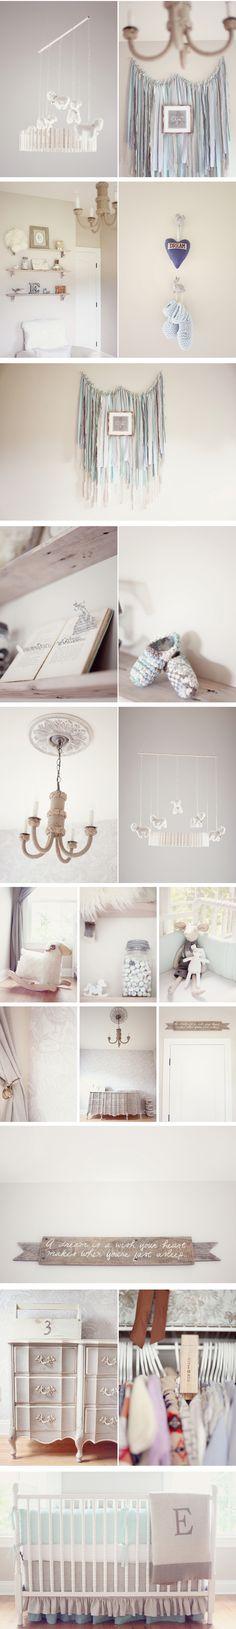 baby boy vintage nursery design and decor